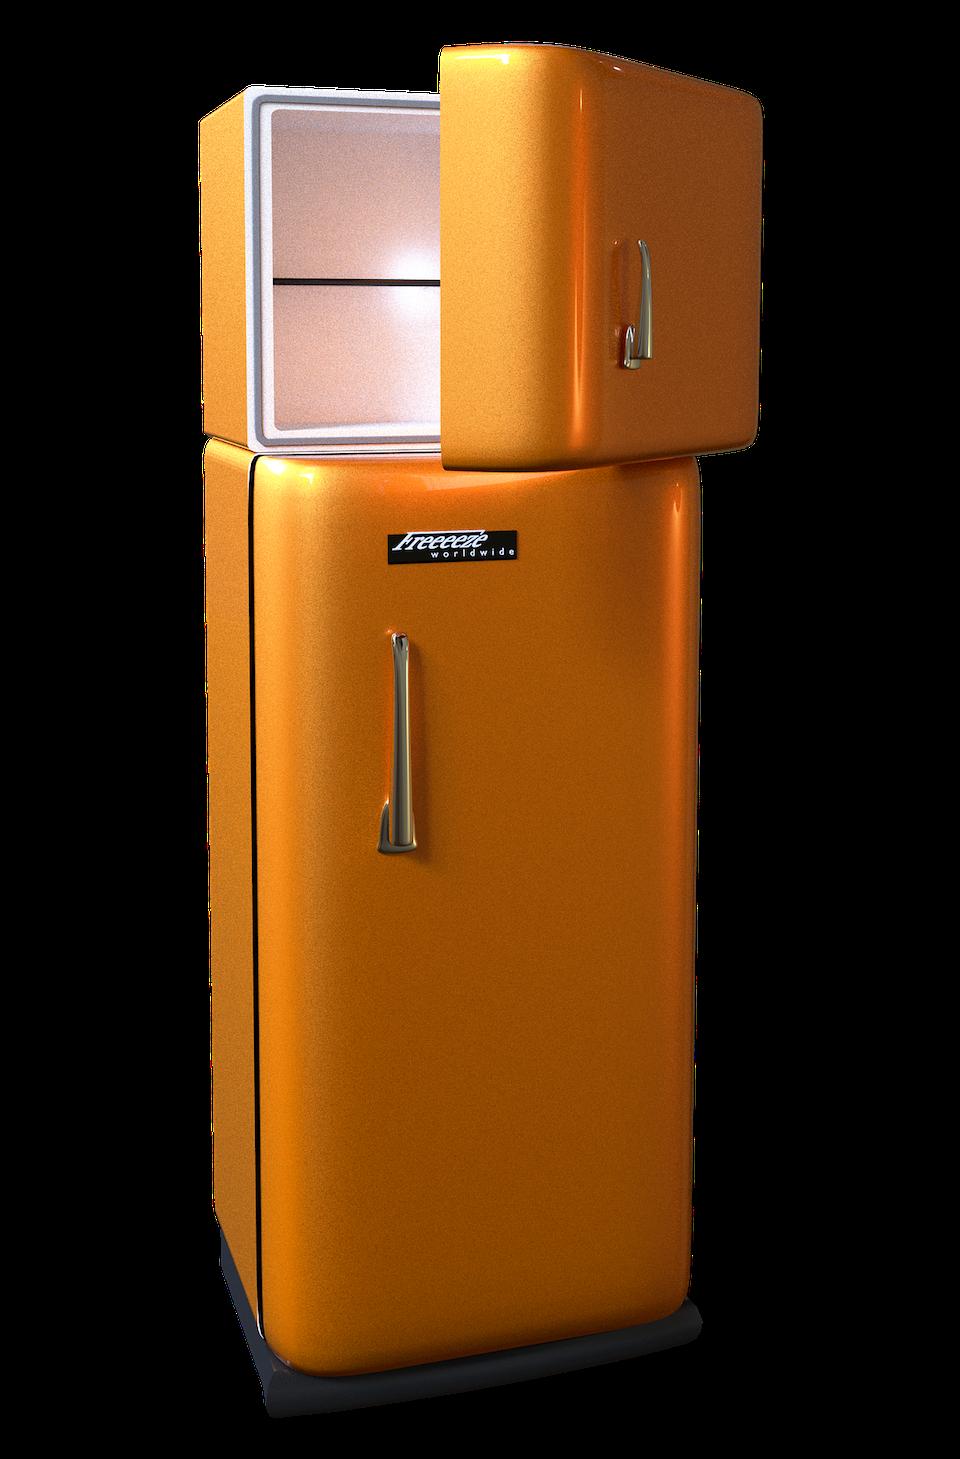 frigoriferi caratteristiche